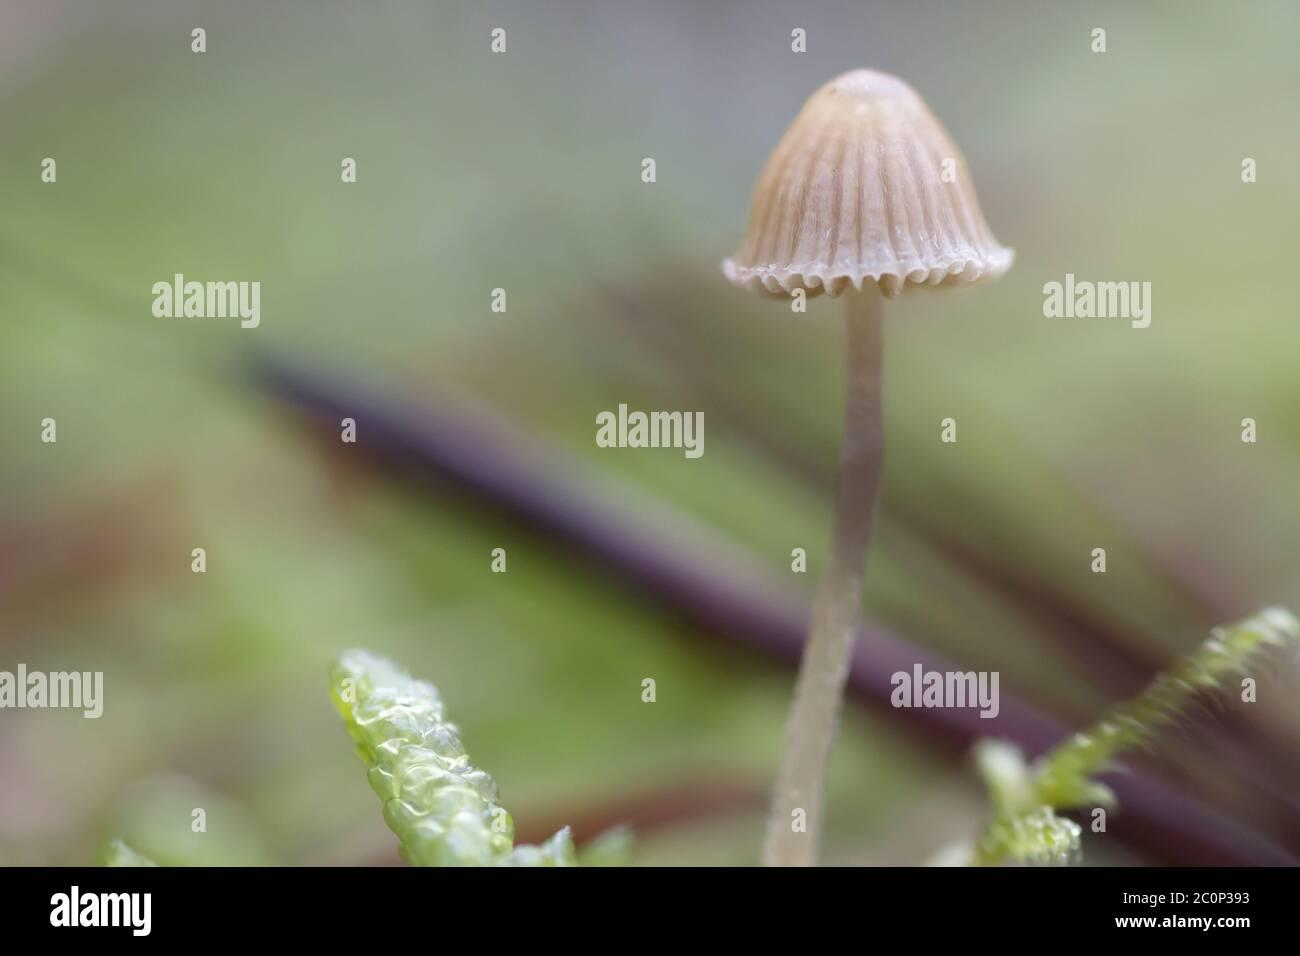 Pequeño hongo silvestre micena de cerca Foto de stock